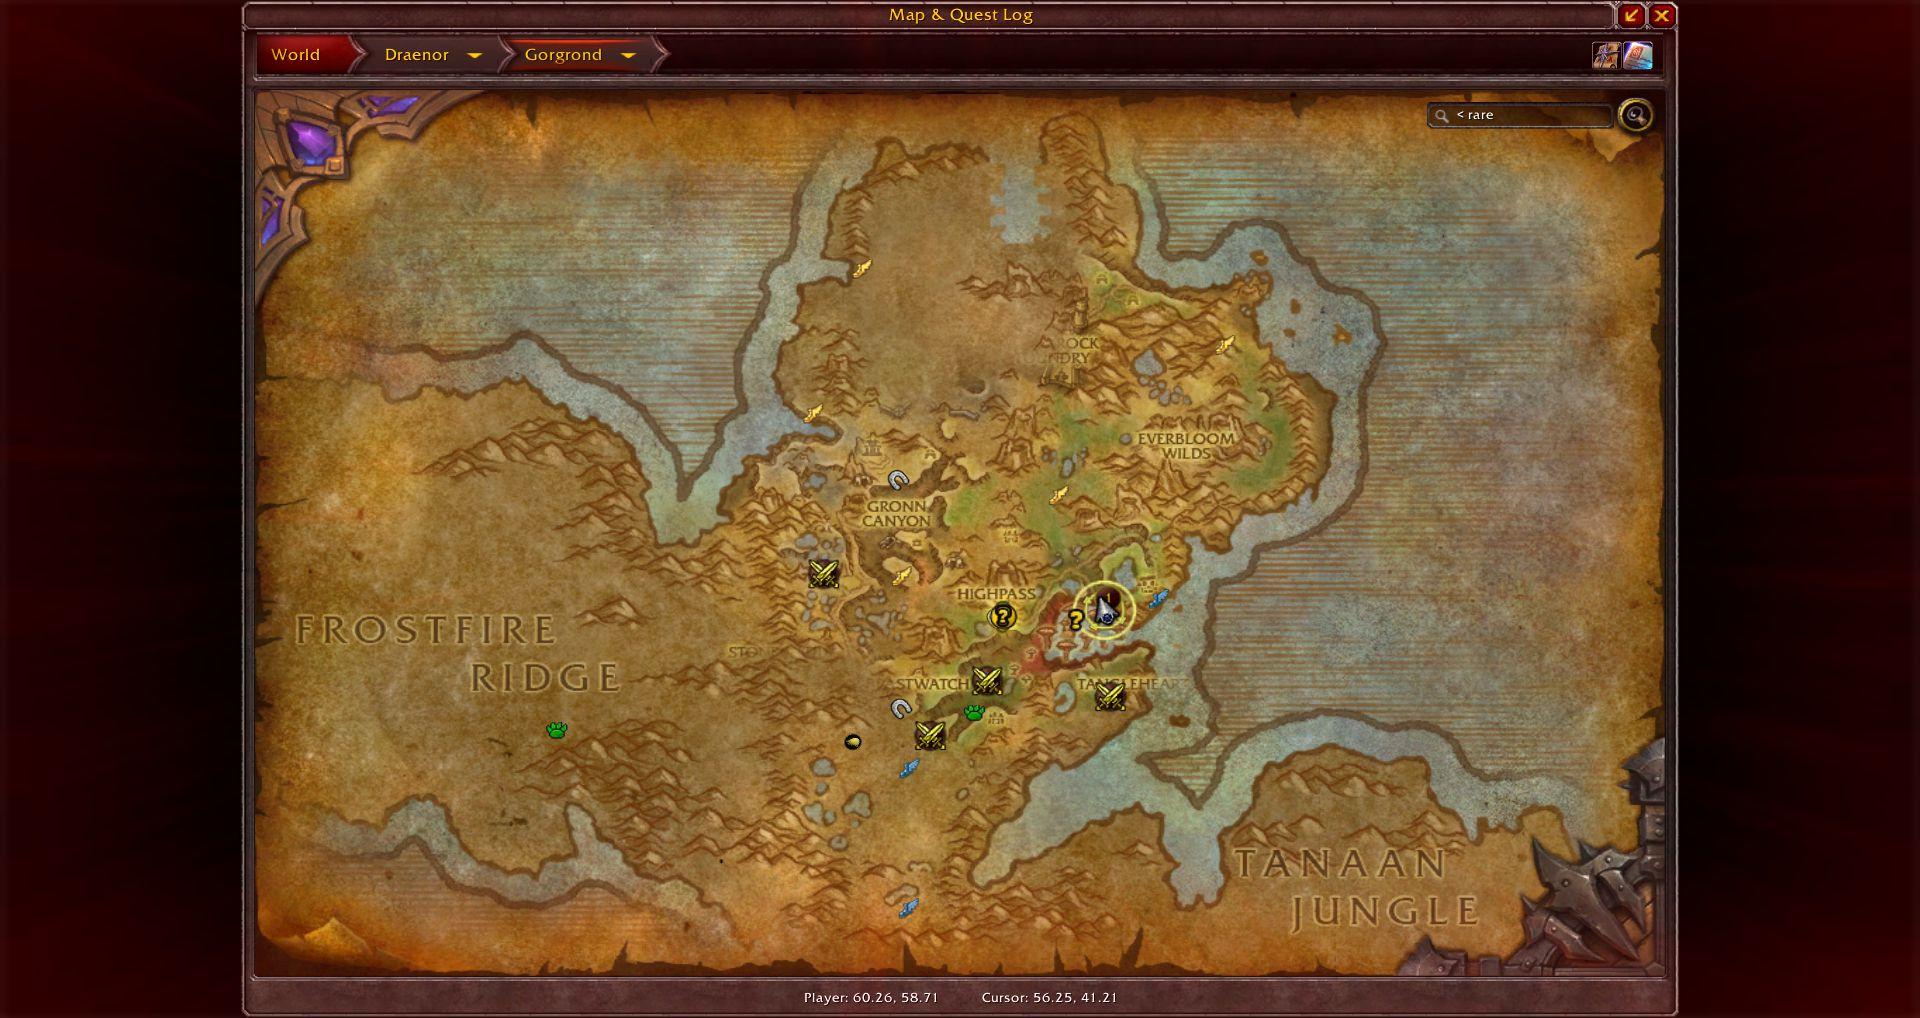 Gorgrond map wow screenshot gamingcfg gorgrond map wow screenshot gumiabroncs Images